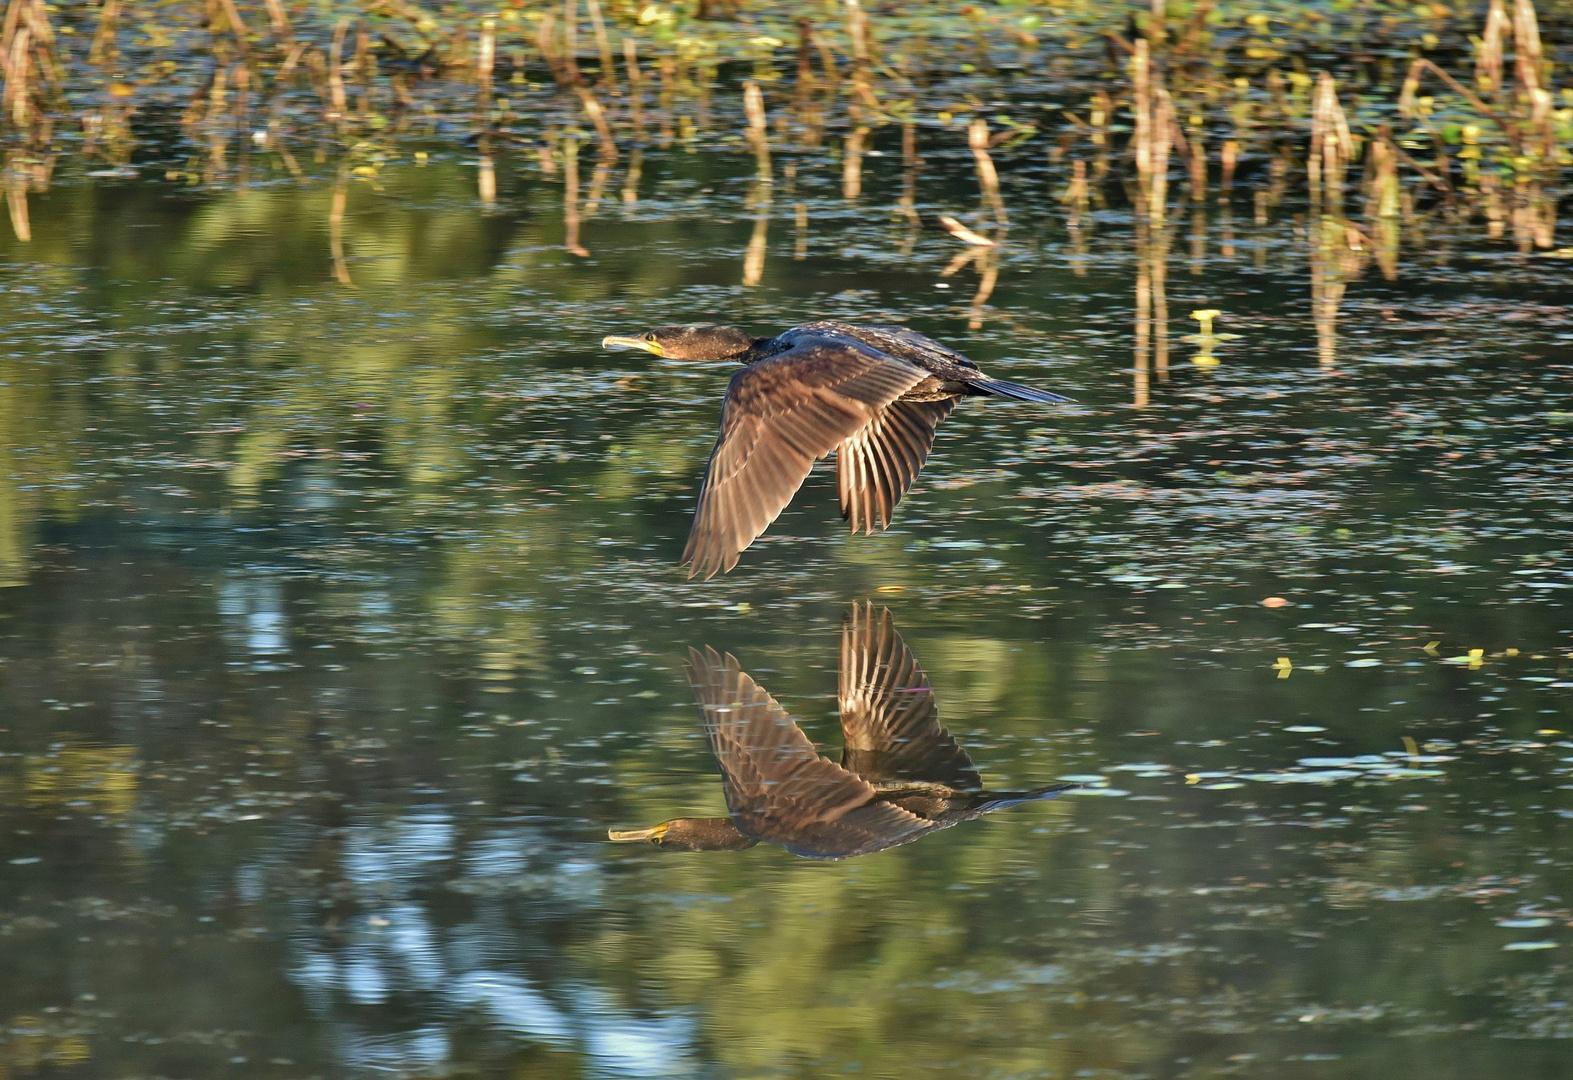 kormoran im flug foto  bild  tiere wildlife wild